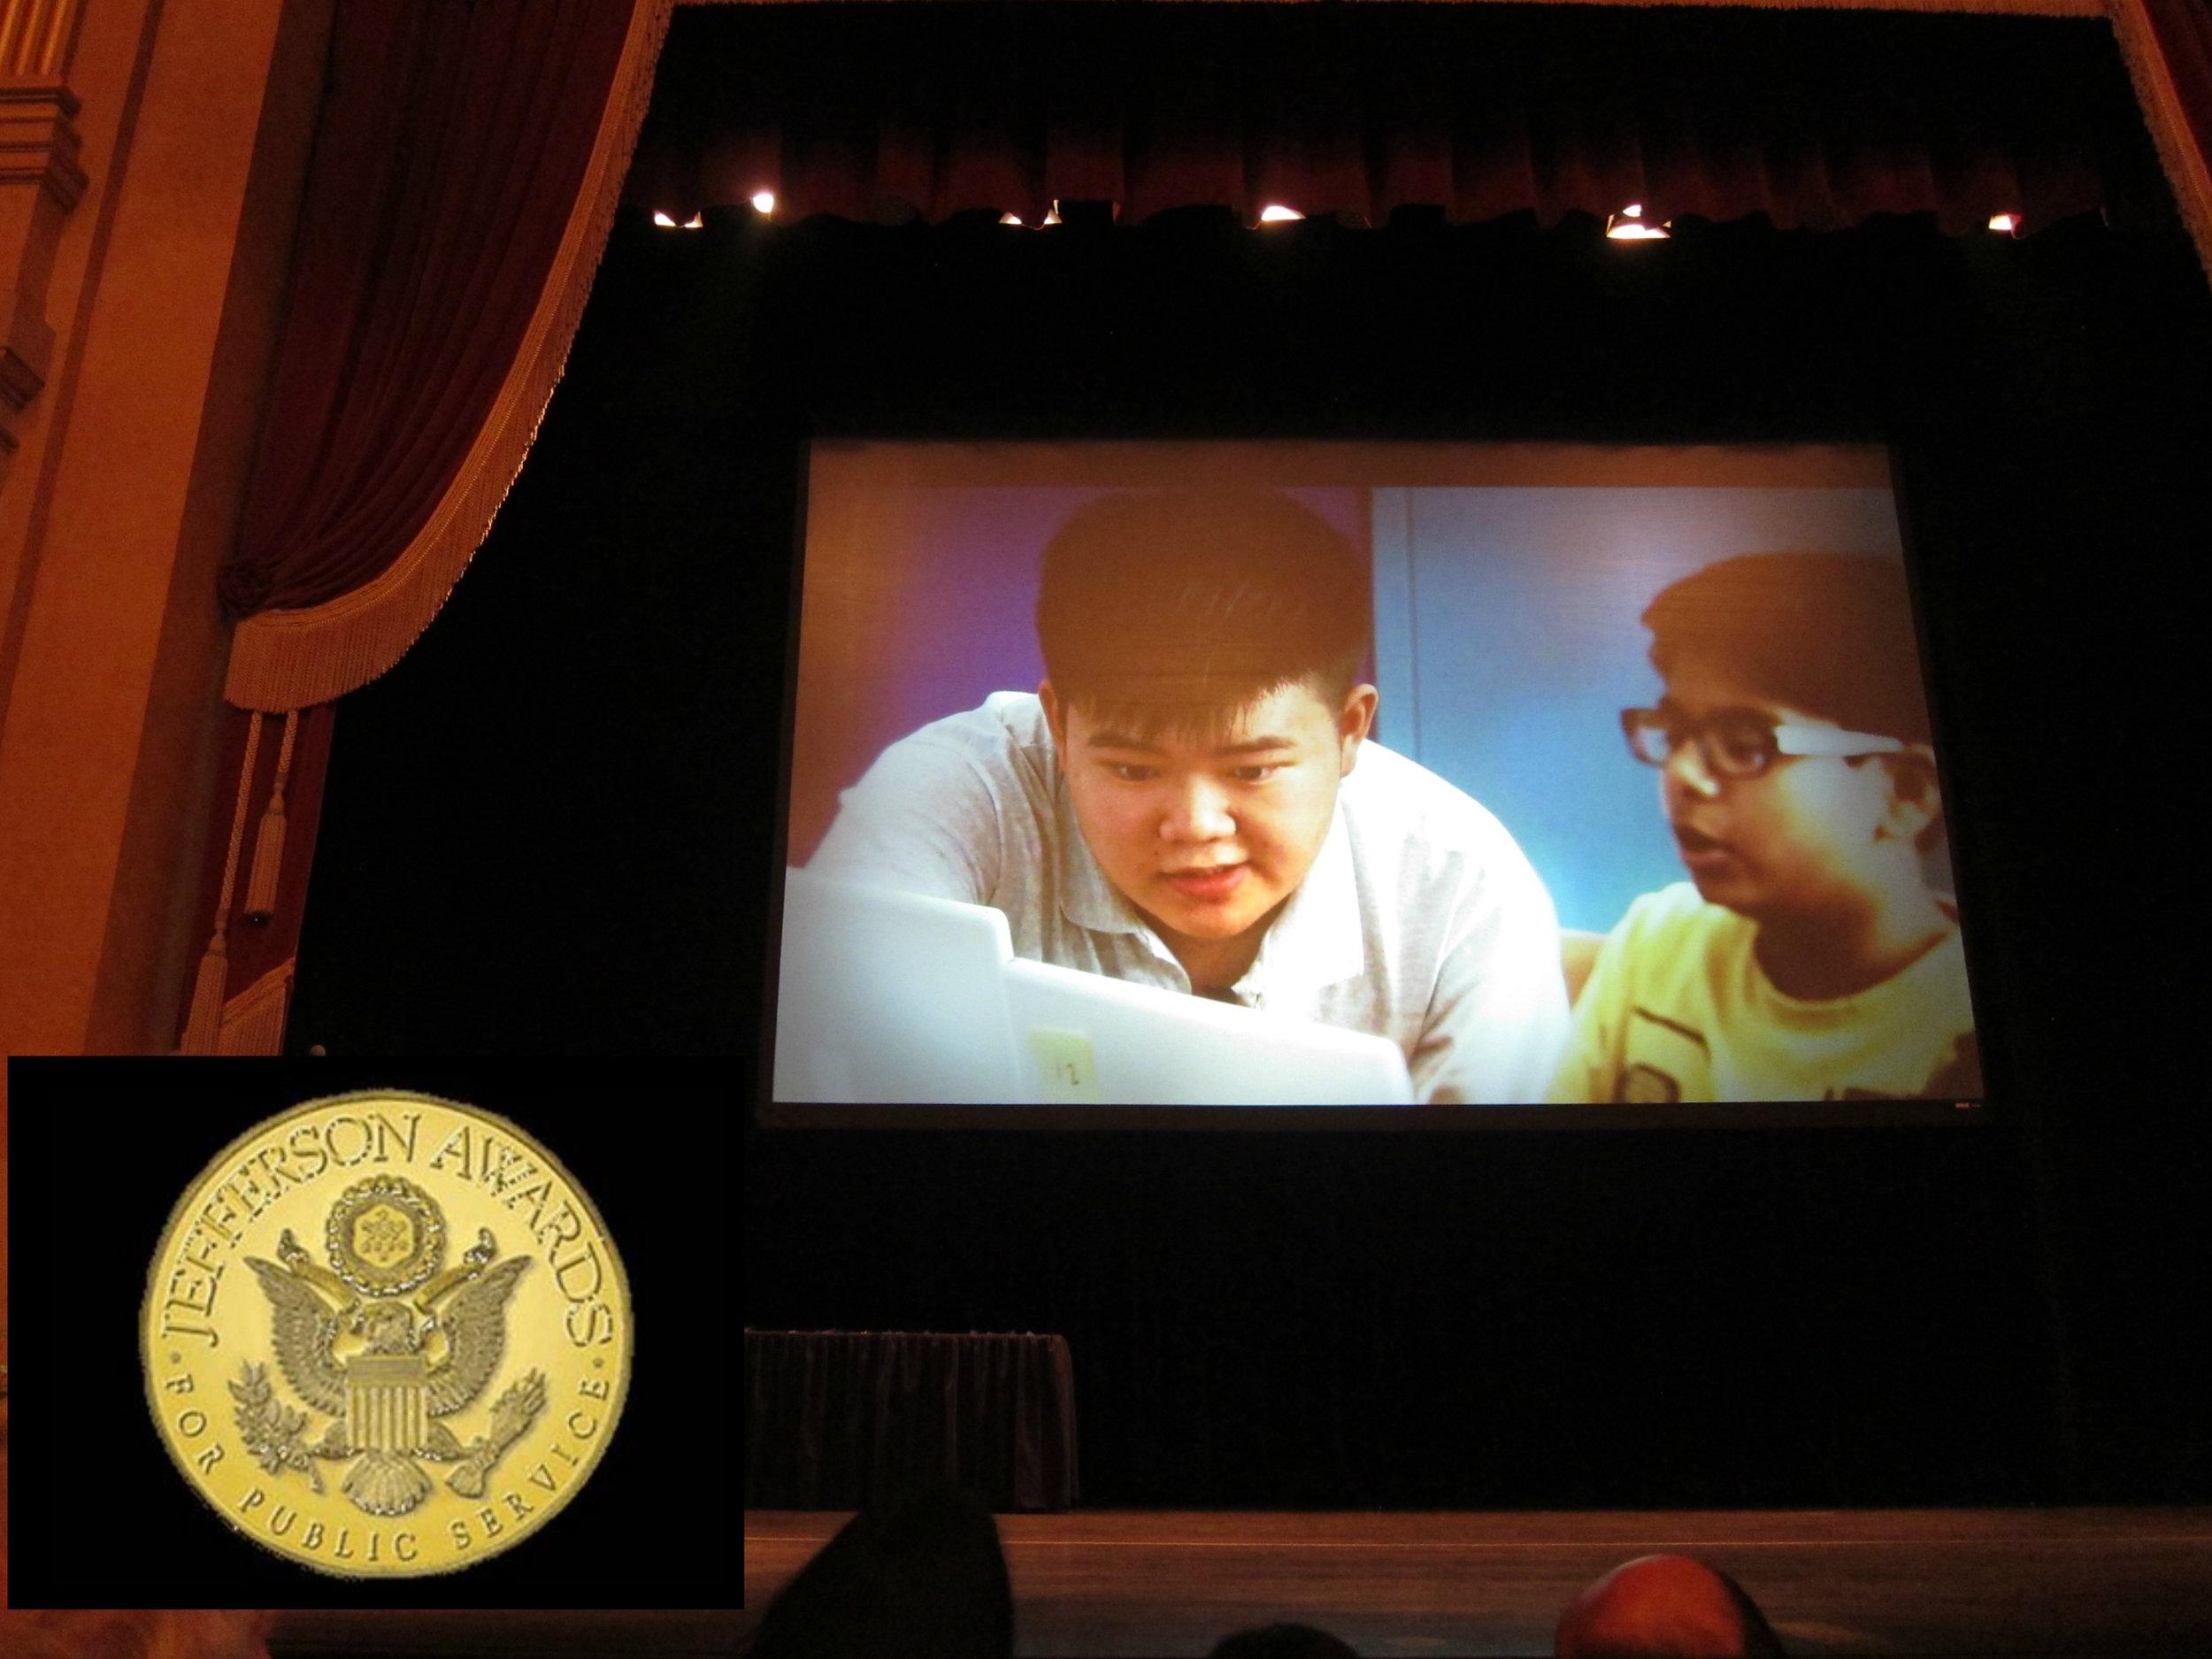 2018 Jefferson Award For Public Service Ceremony